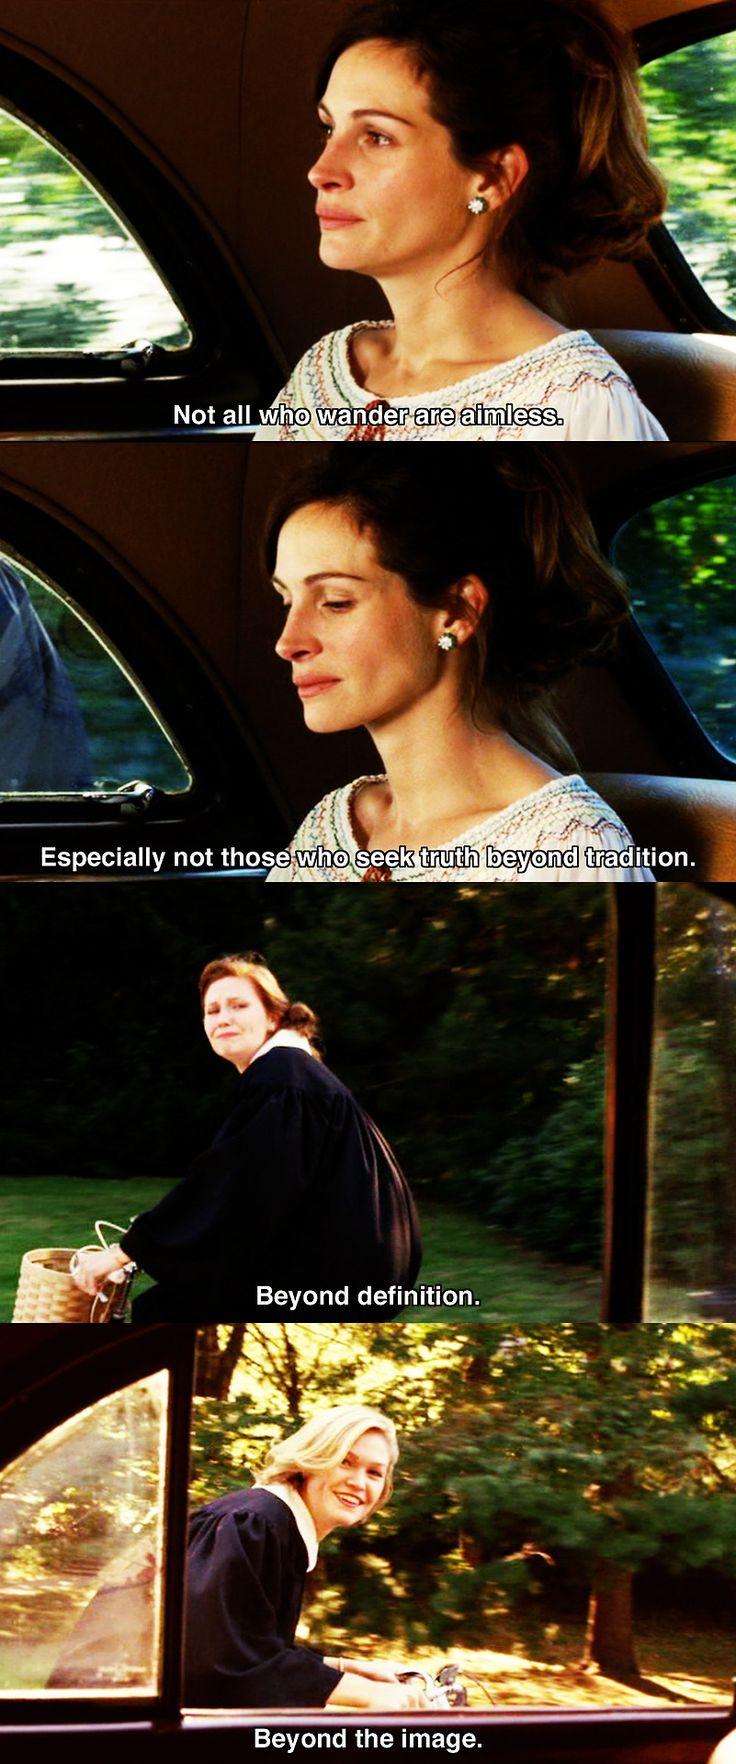 Mona Lisa Smile (2003) -about wanderers